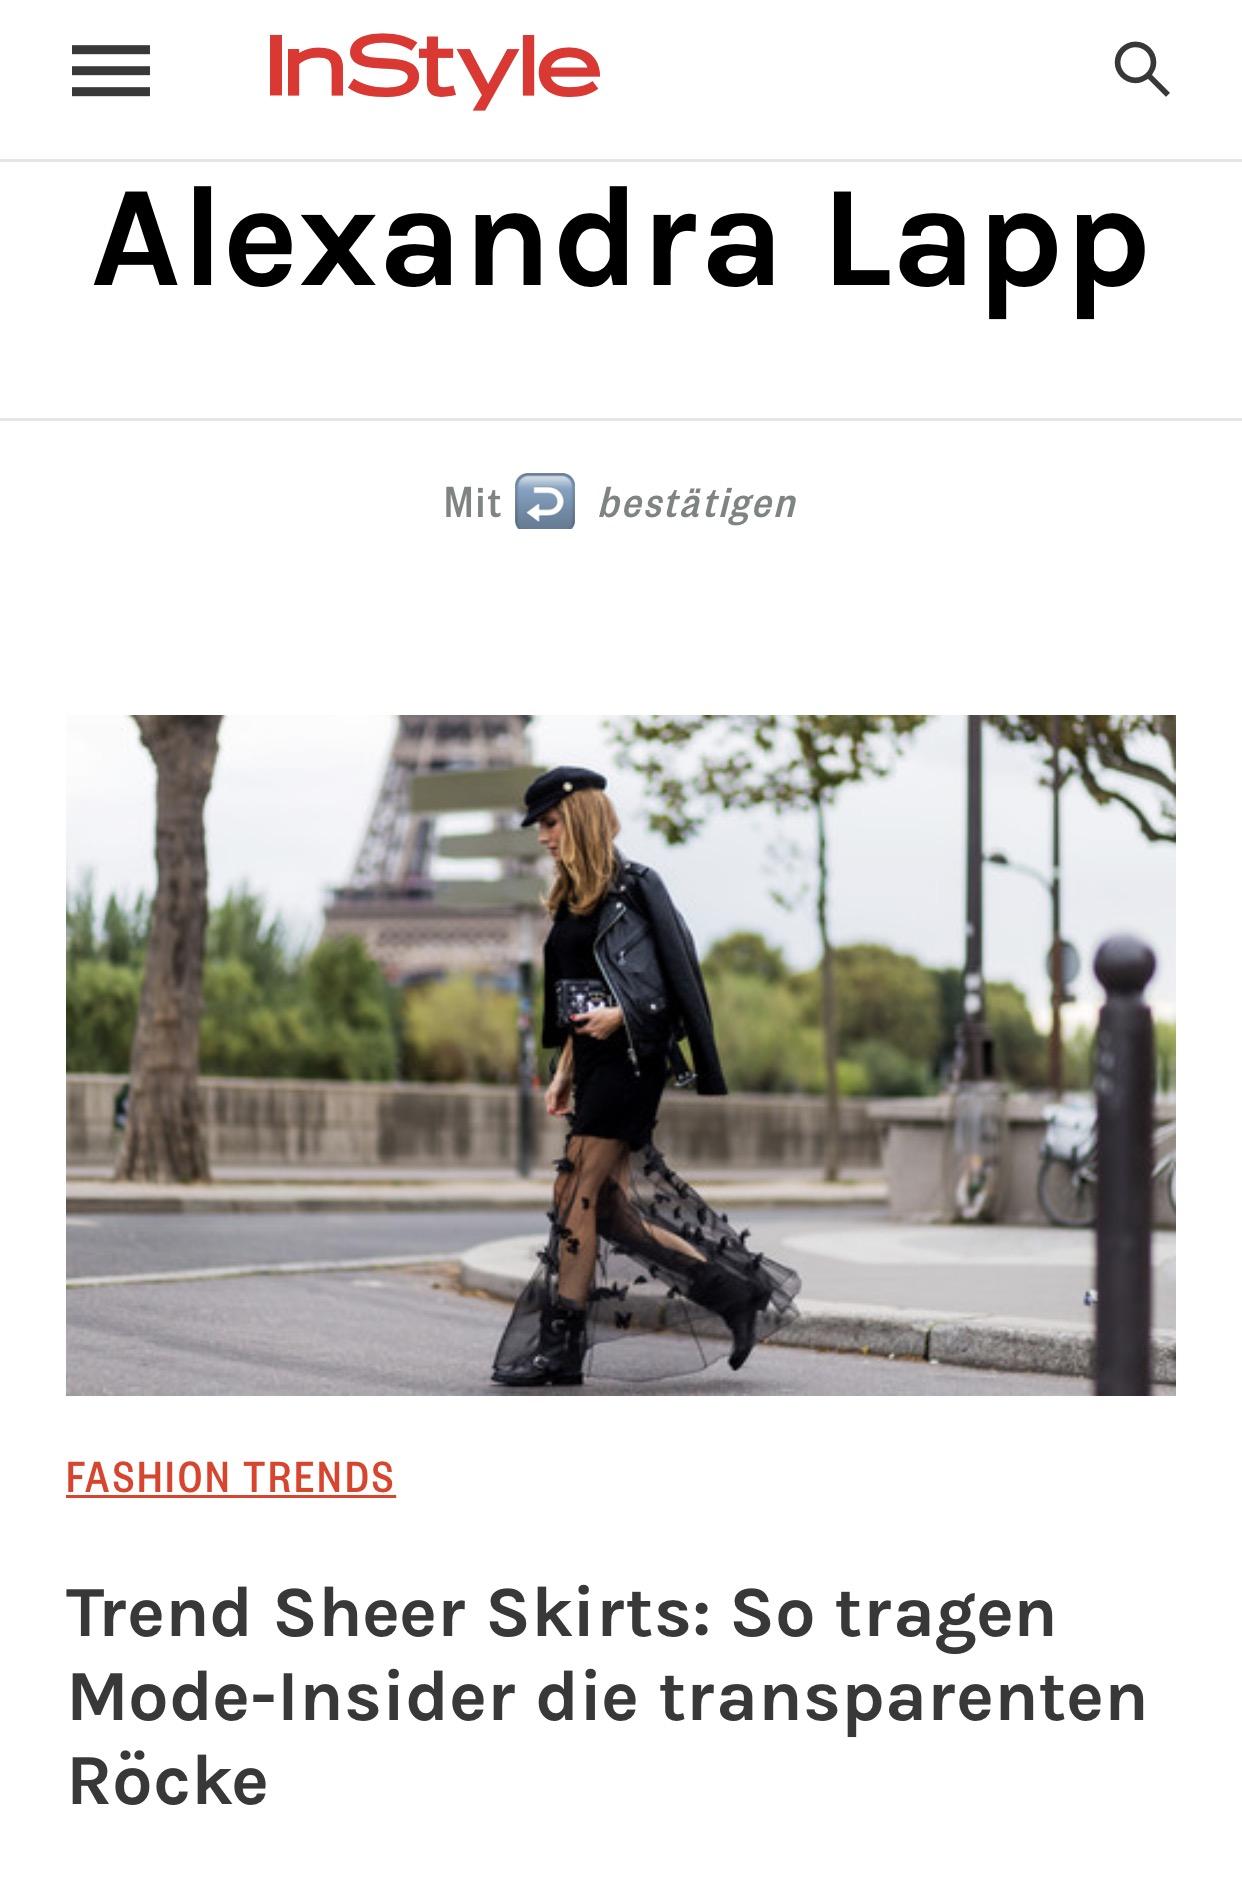 Trend Sheer Skirts - instyle - 2017-03 - Alexandra Lapp